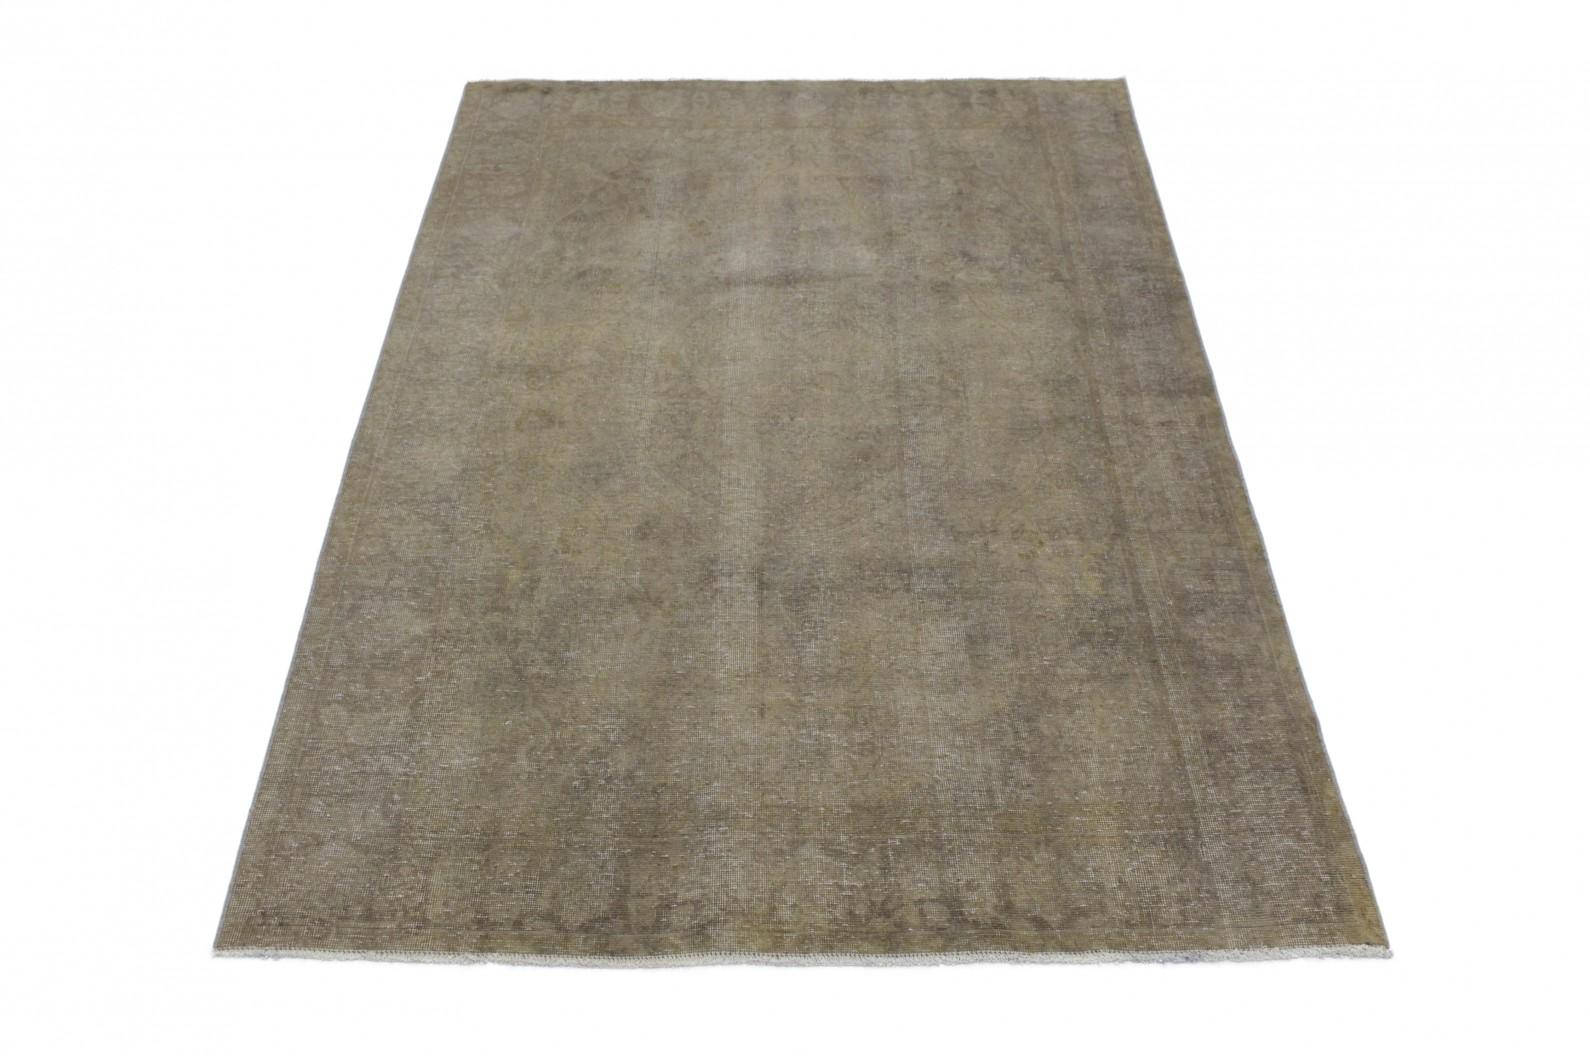 Vintage Teppich Beige Grau In 290x190 1001 177292 Bei Carpetido De